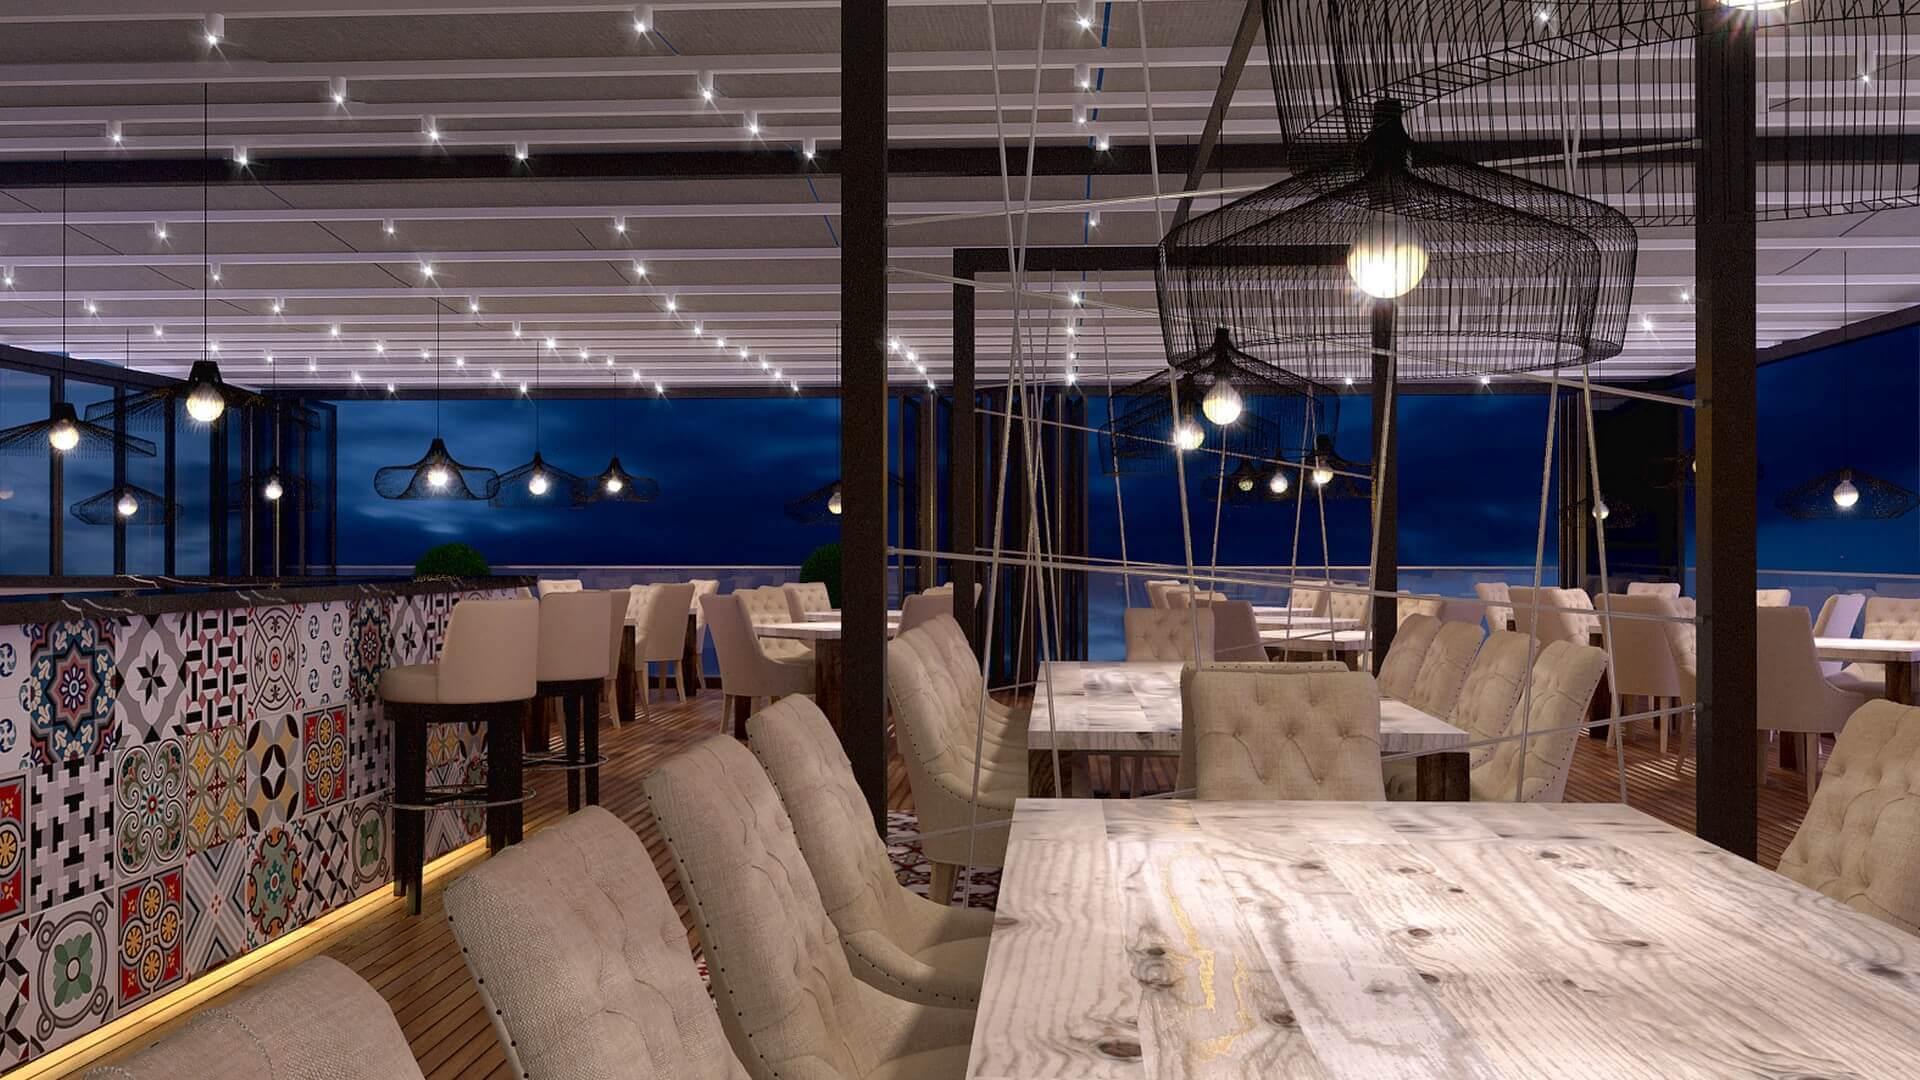 restorant iç mimar 2097 Iskenderun Restoran Restoranlar